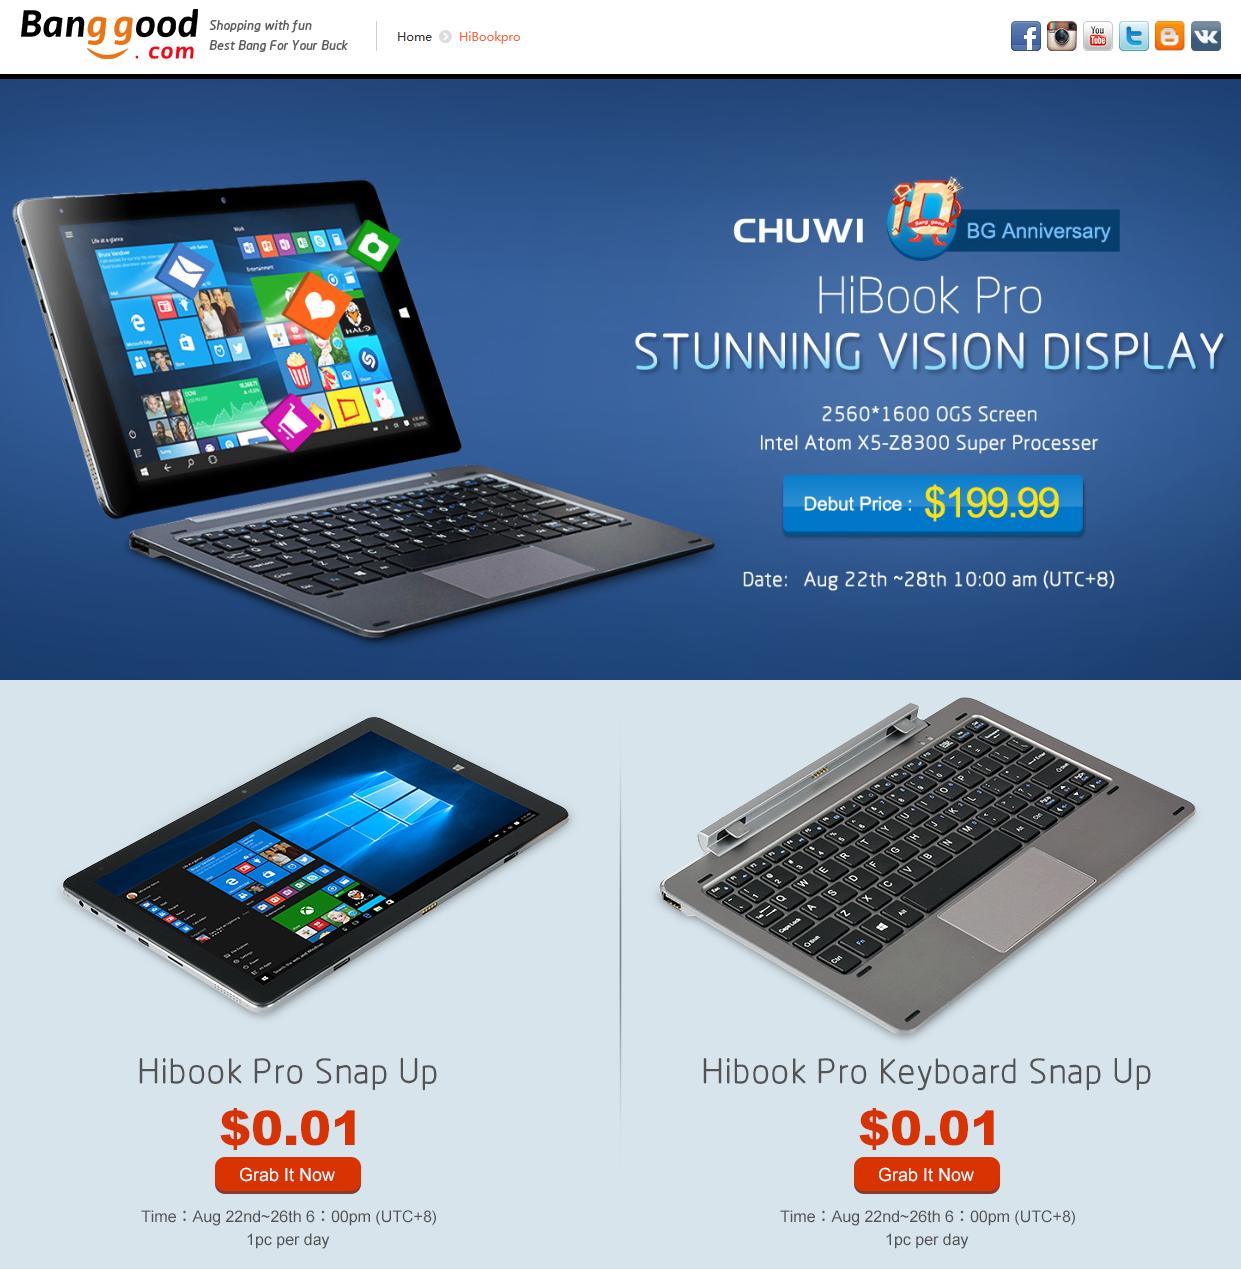 CHUWI HiBook Pro 開封 レビュー